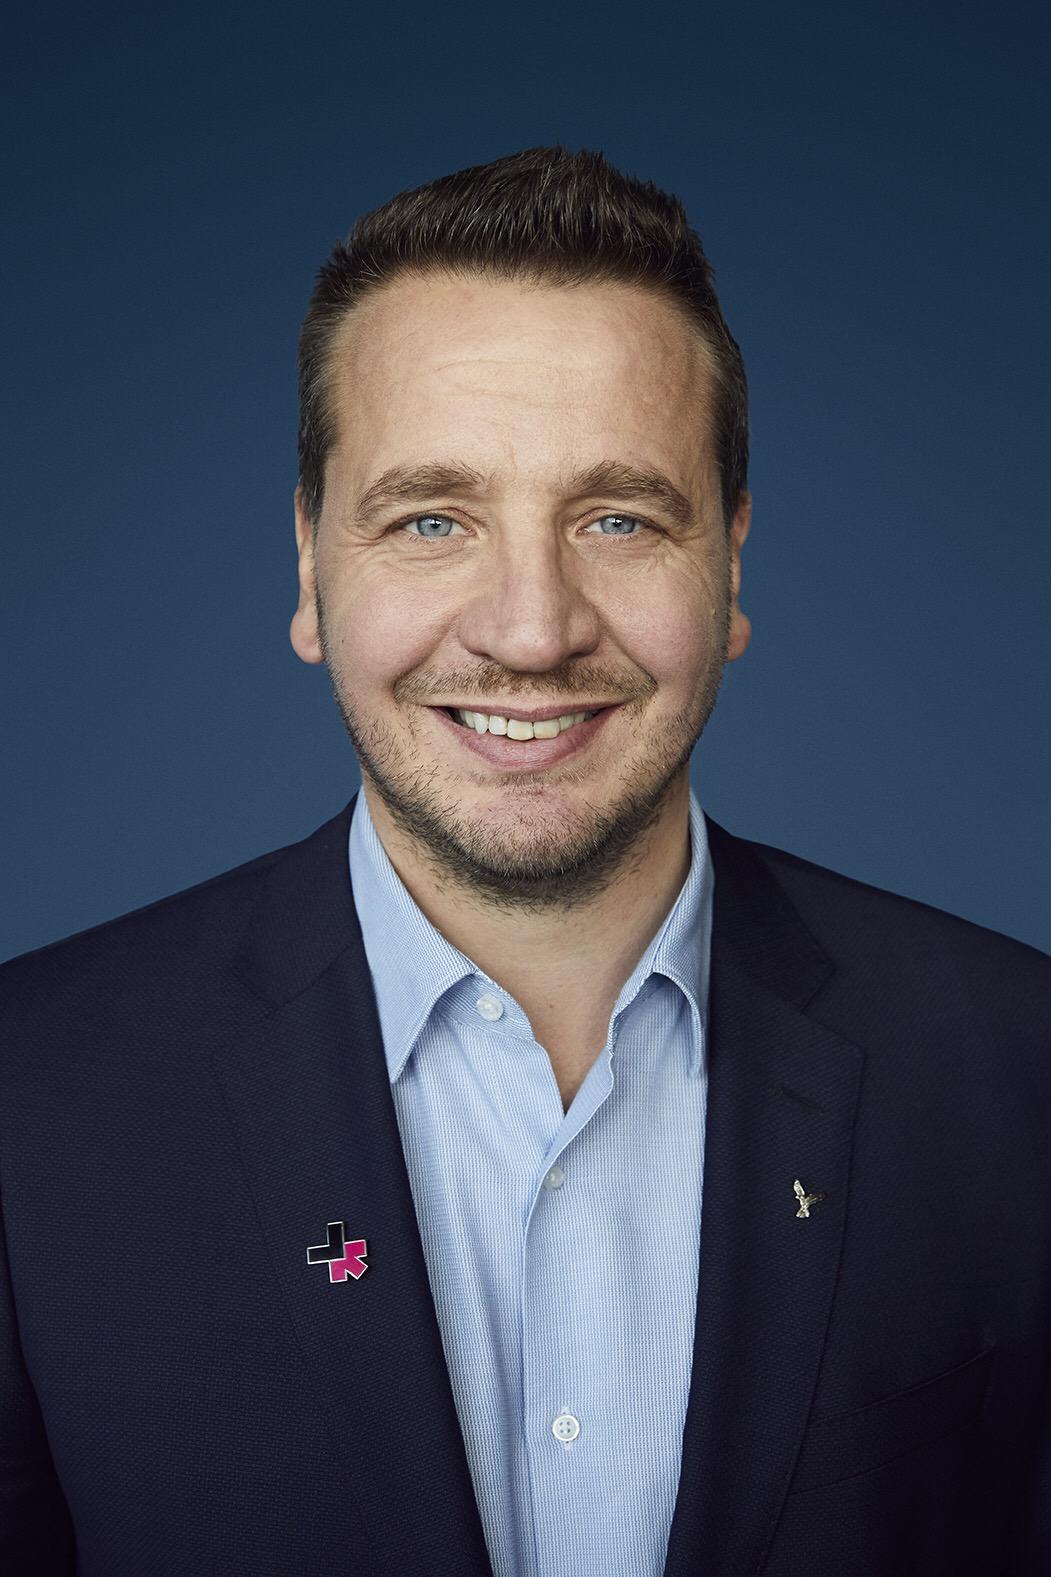 Gudlaugur Thor Thordarsson